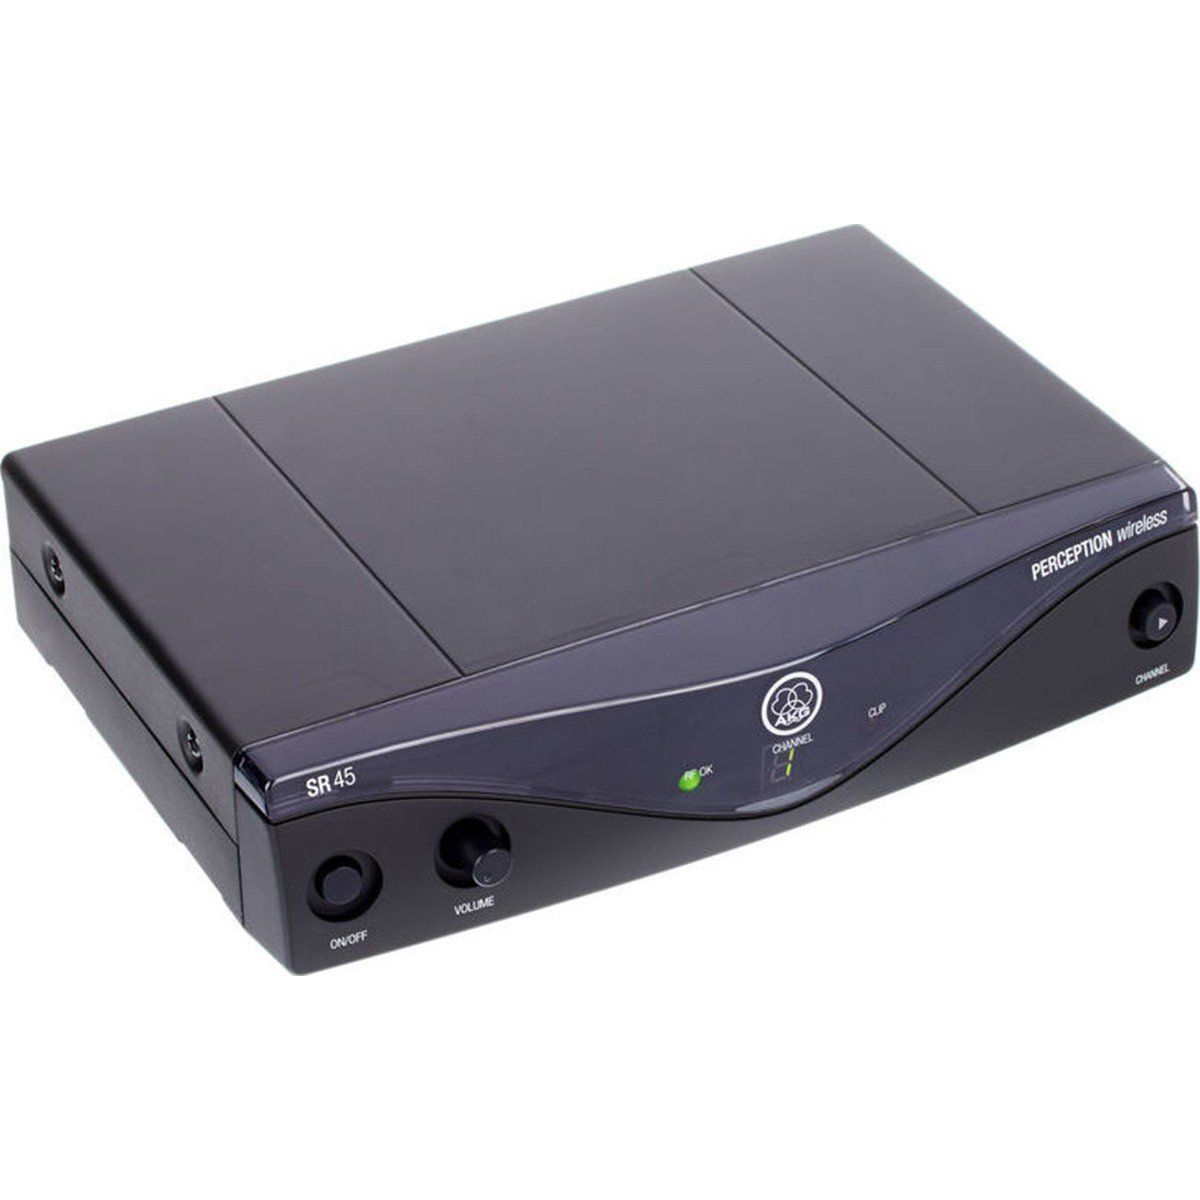 Akg Perception PW 45 Transmissor Akg Perception PW45 para Instrumentos